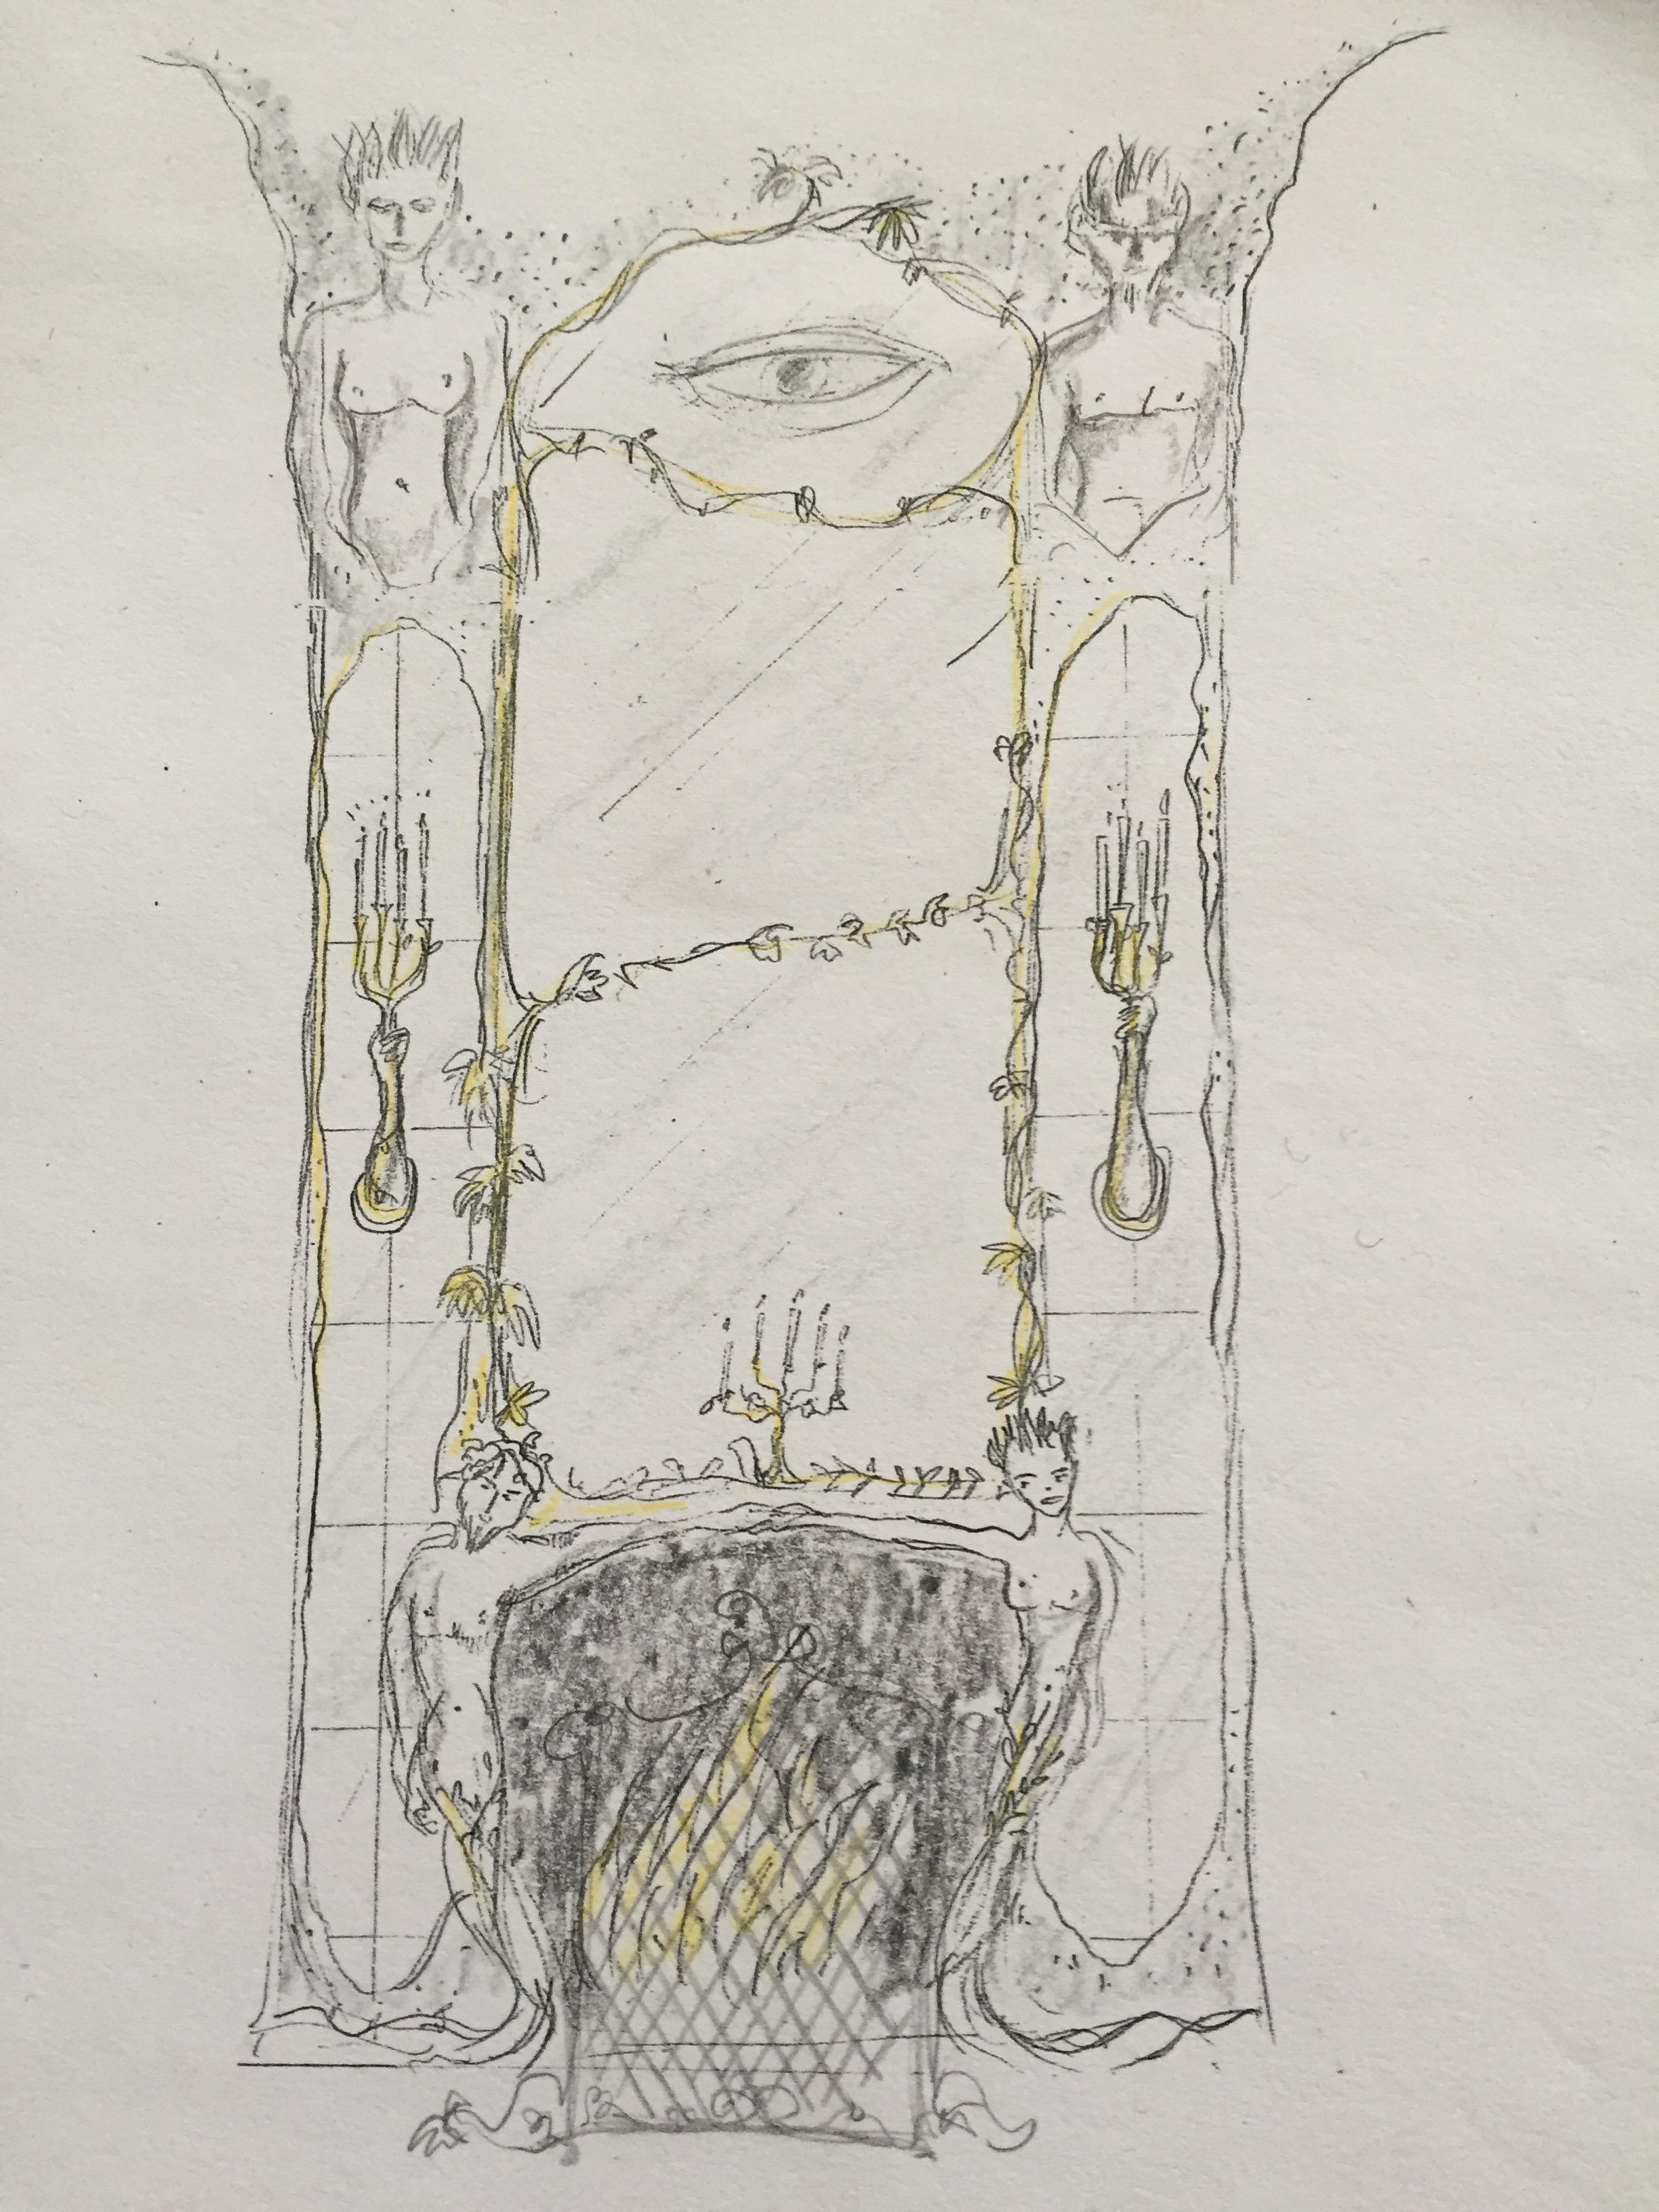 Sleeping Beauty ballet - producction design - David Roger 5.jpg